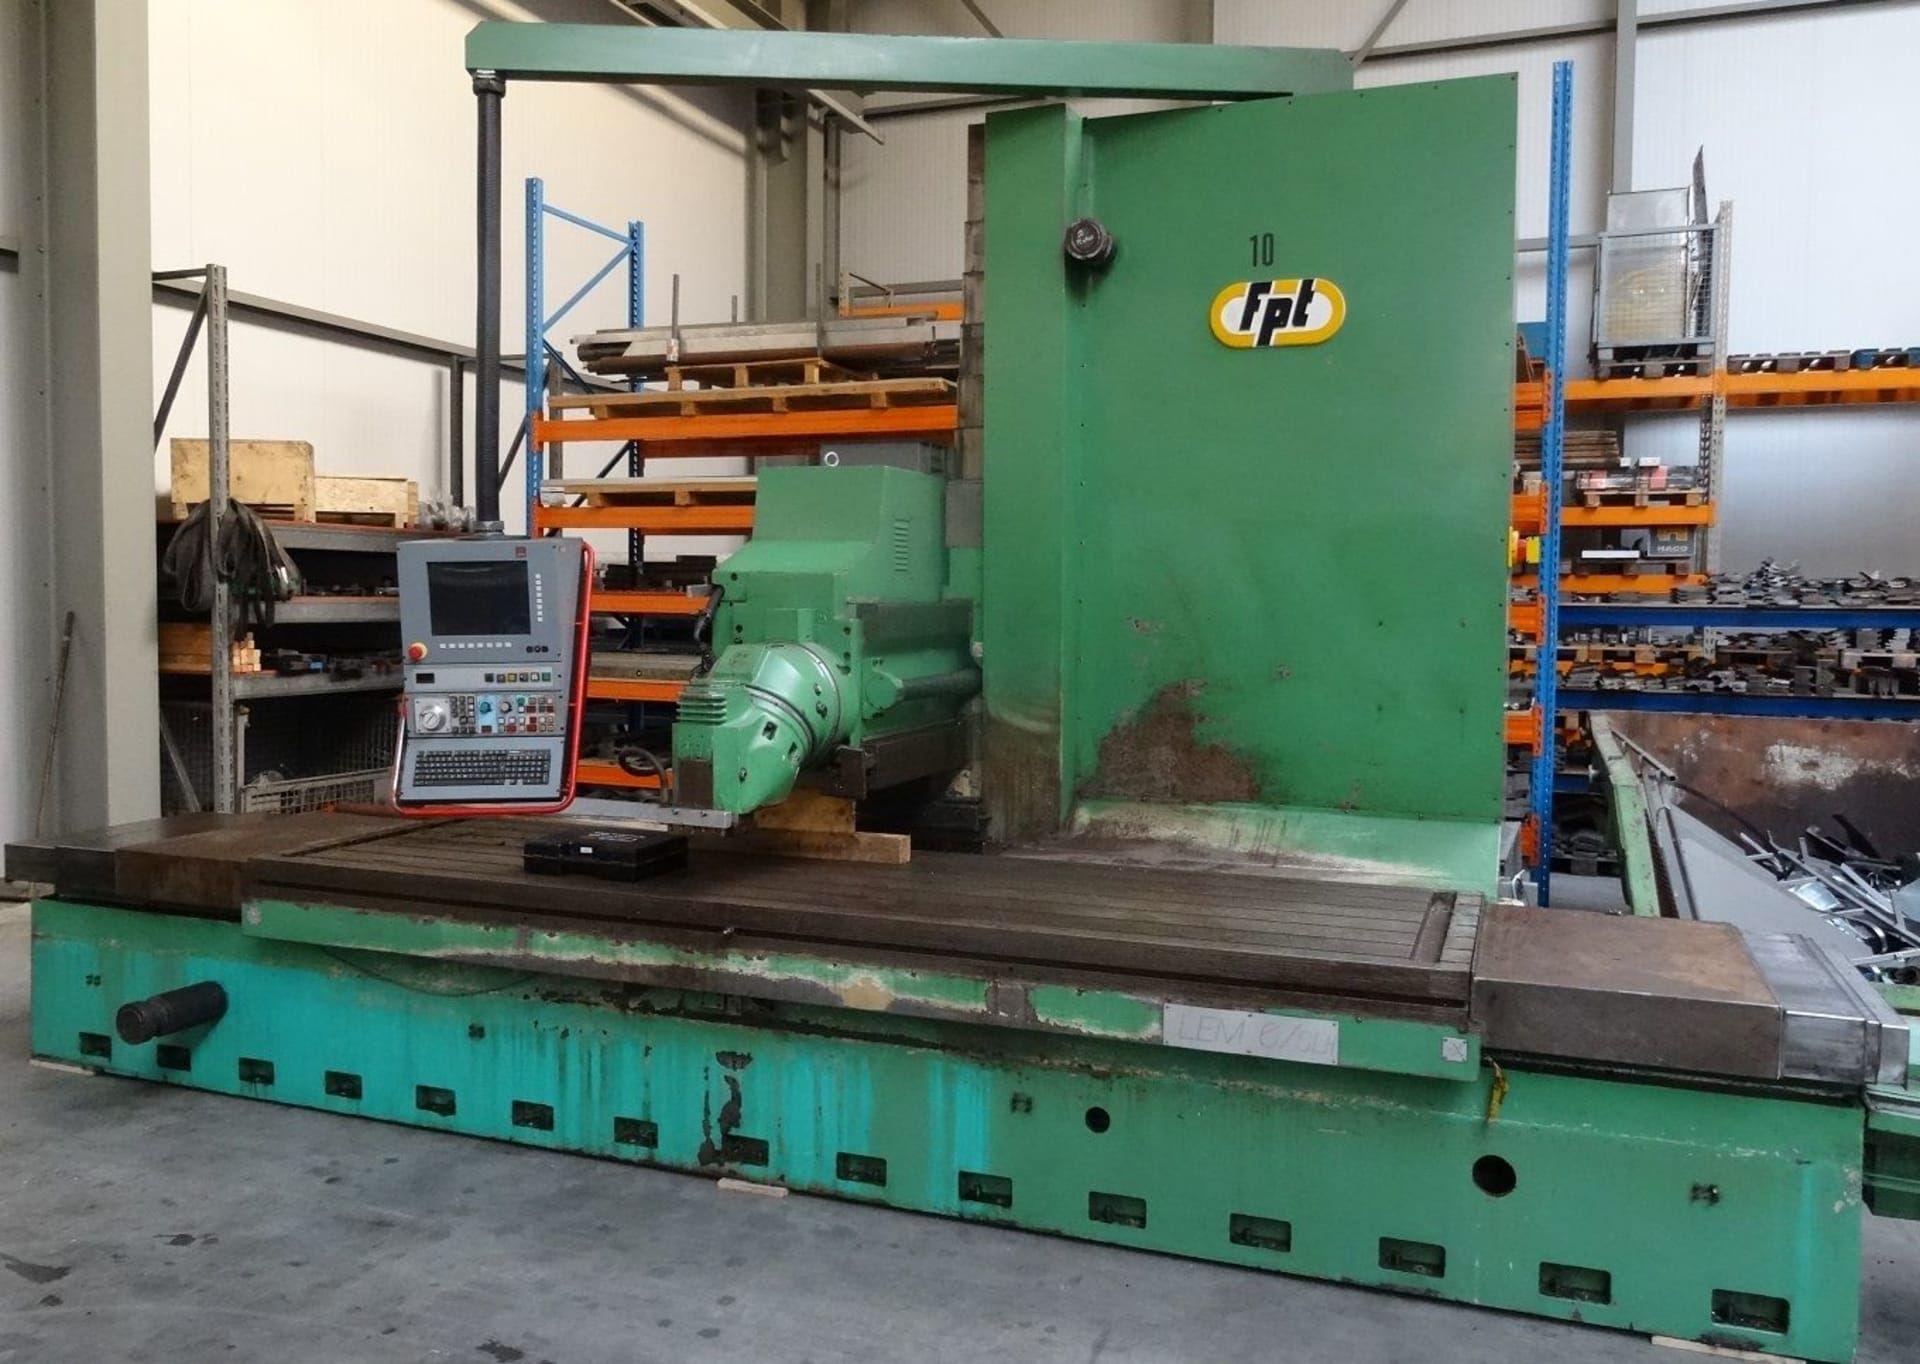 FPT LEM 6 SLH CNC-Fräsmaschine